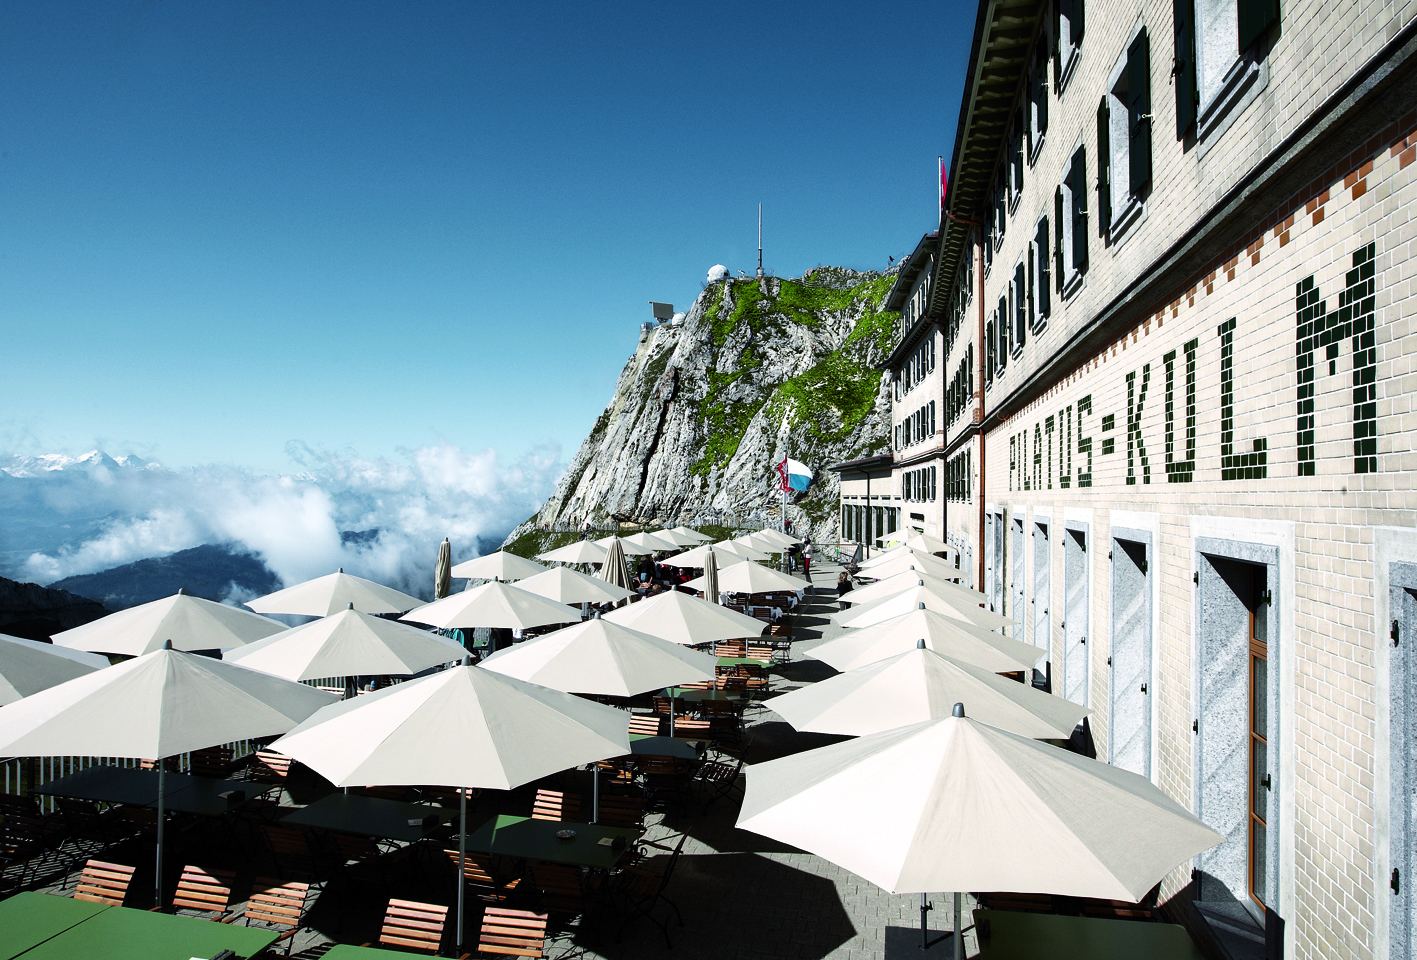 Pilatus Kulmhotel Werbung, Switzerland